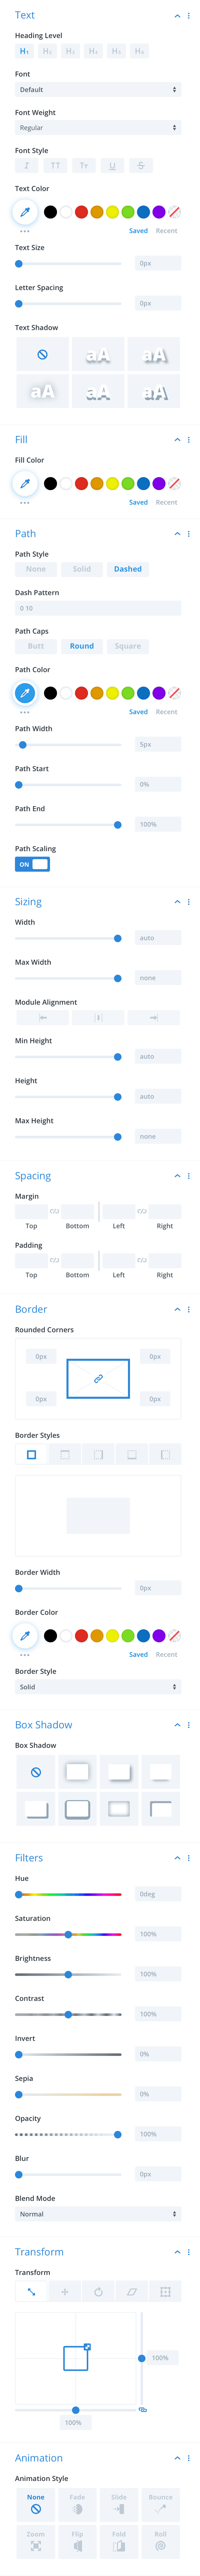 Divi-Modules – Text-On-A-Path design settings